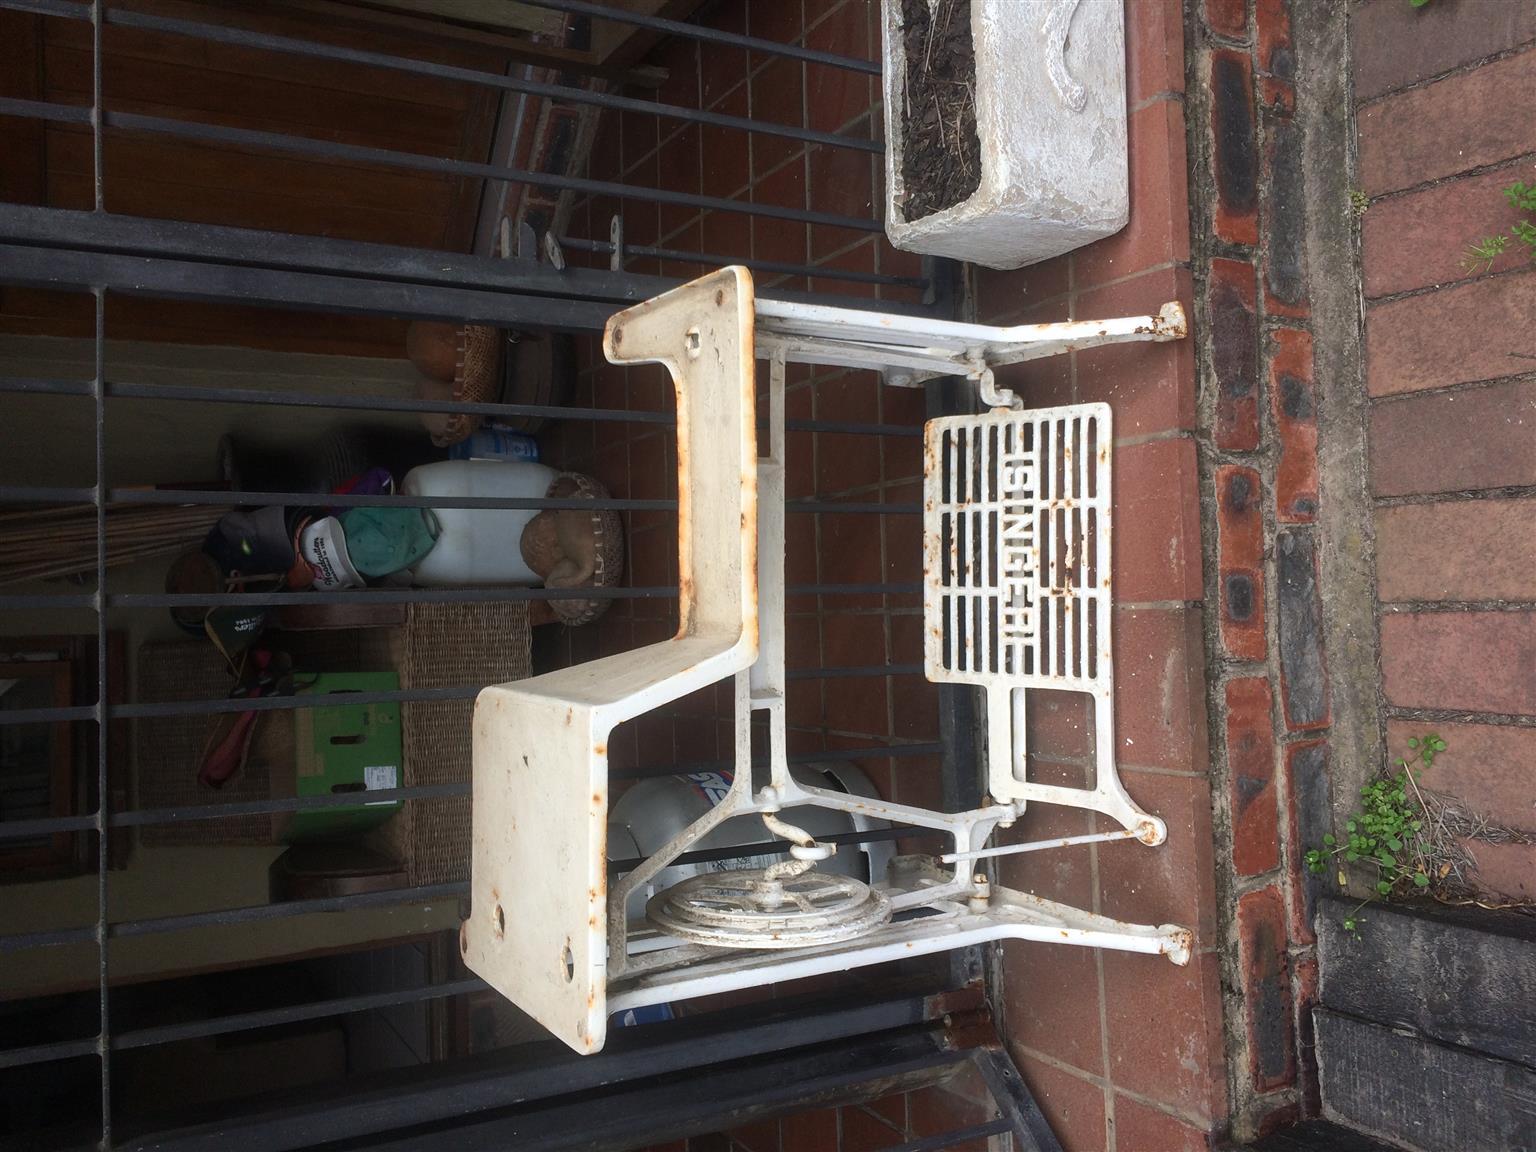 Antique Singer sewing machine stand